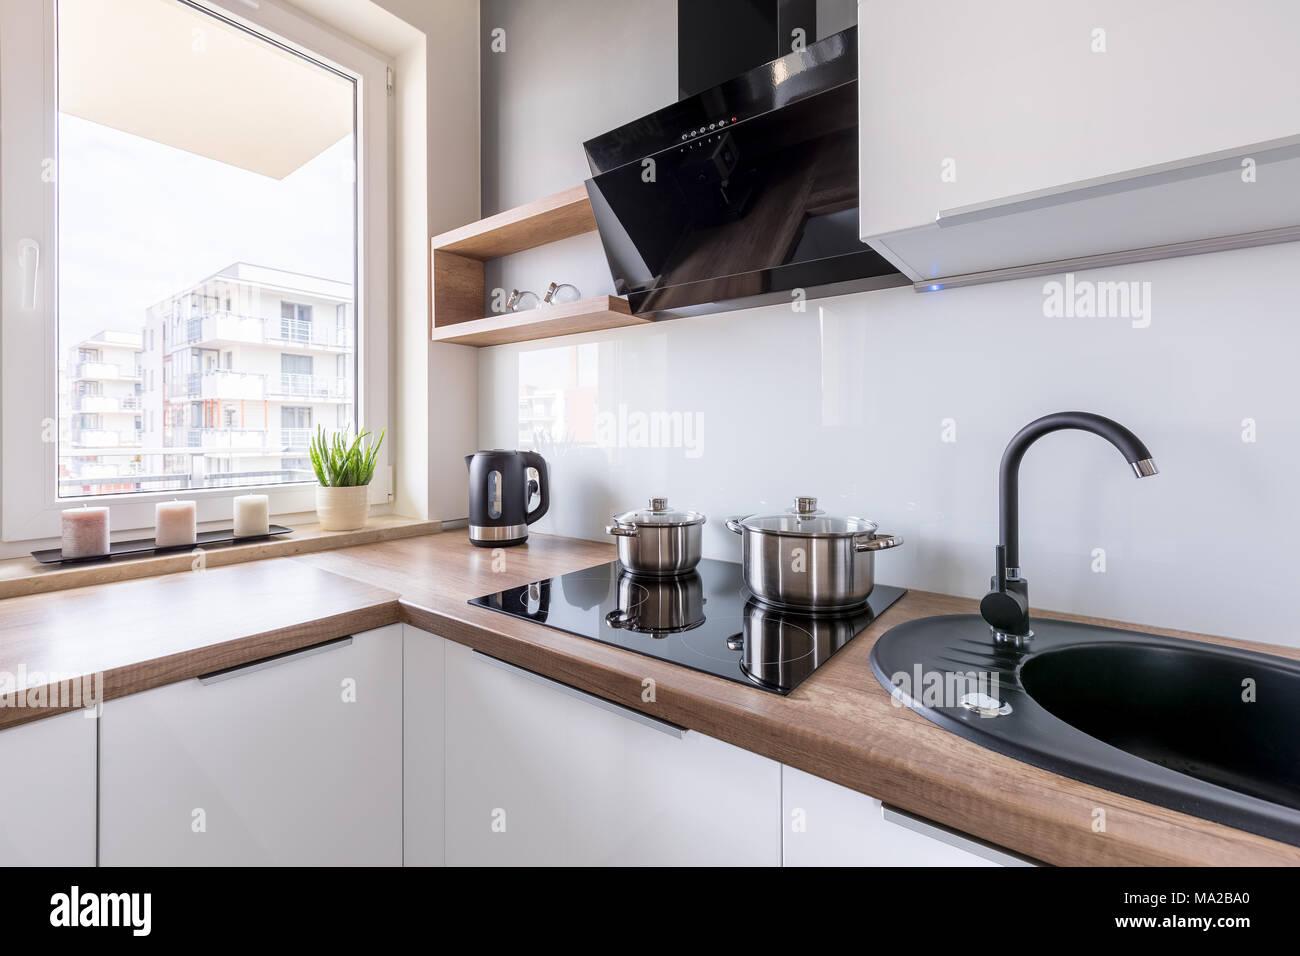 Cucina bianca con piano nero piastrelle per cucina bianca